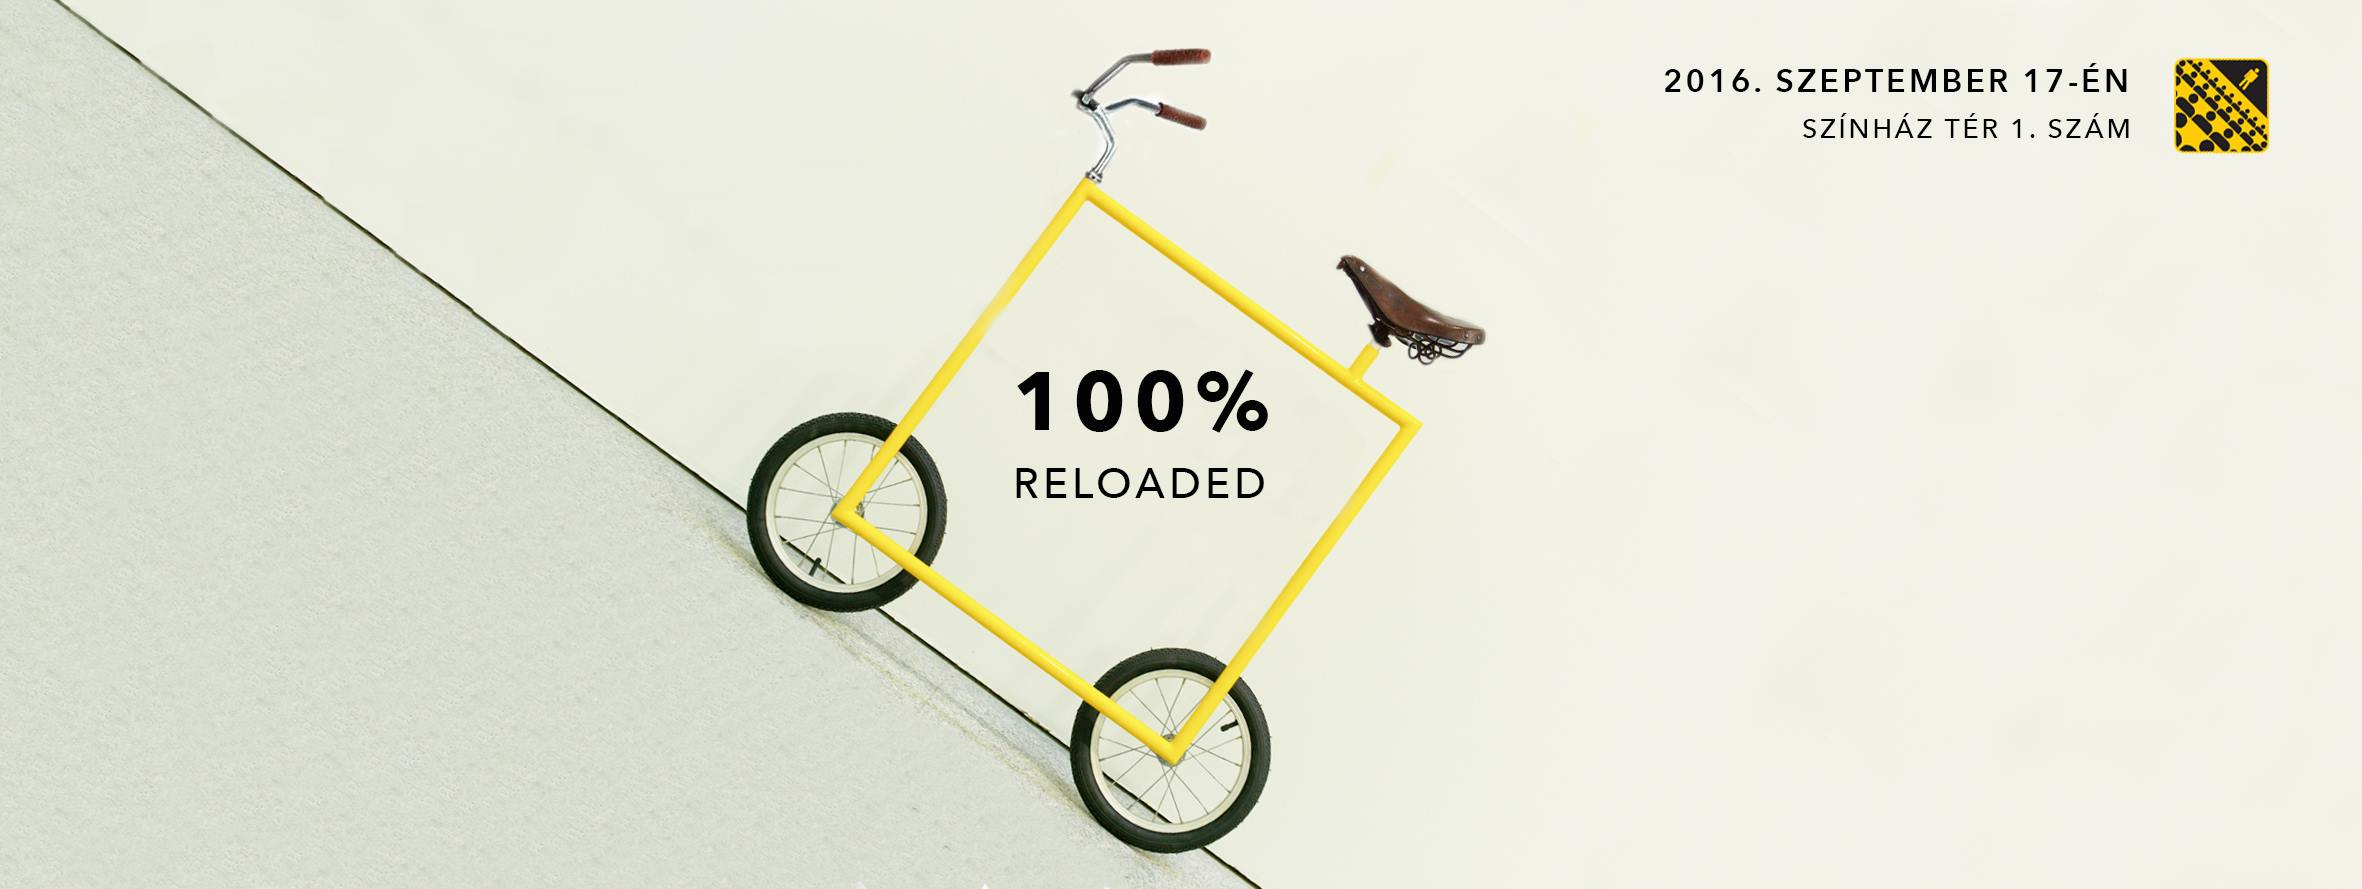 100 RELOADED